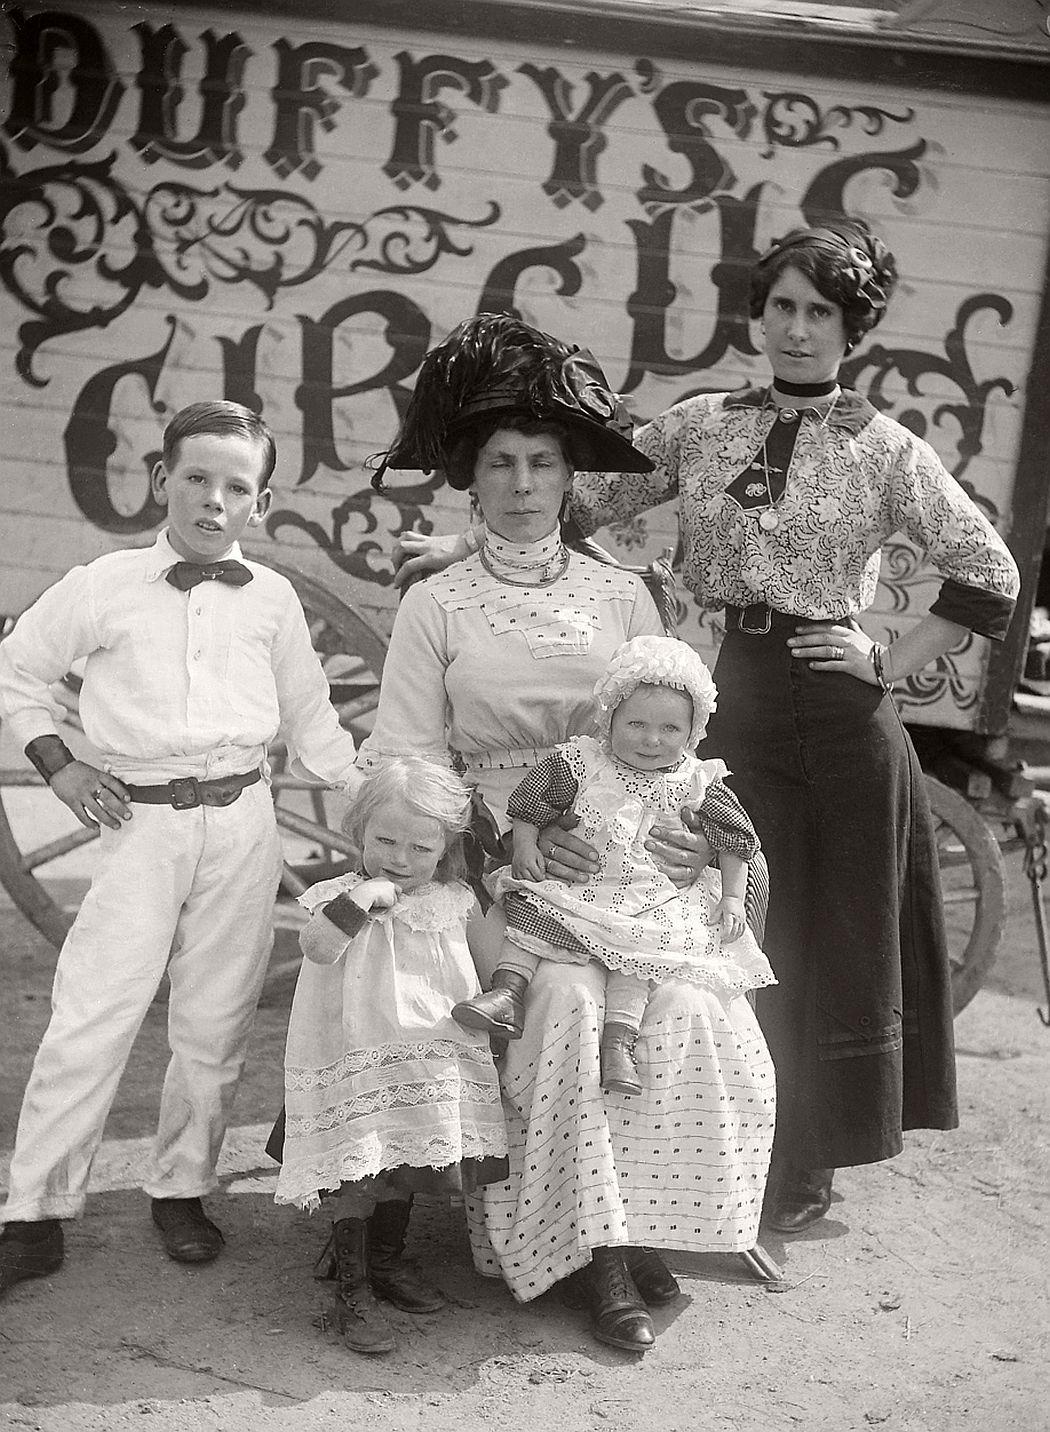 vintage-circus-performers-in-strabane-1910-1911-15